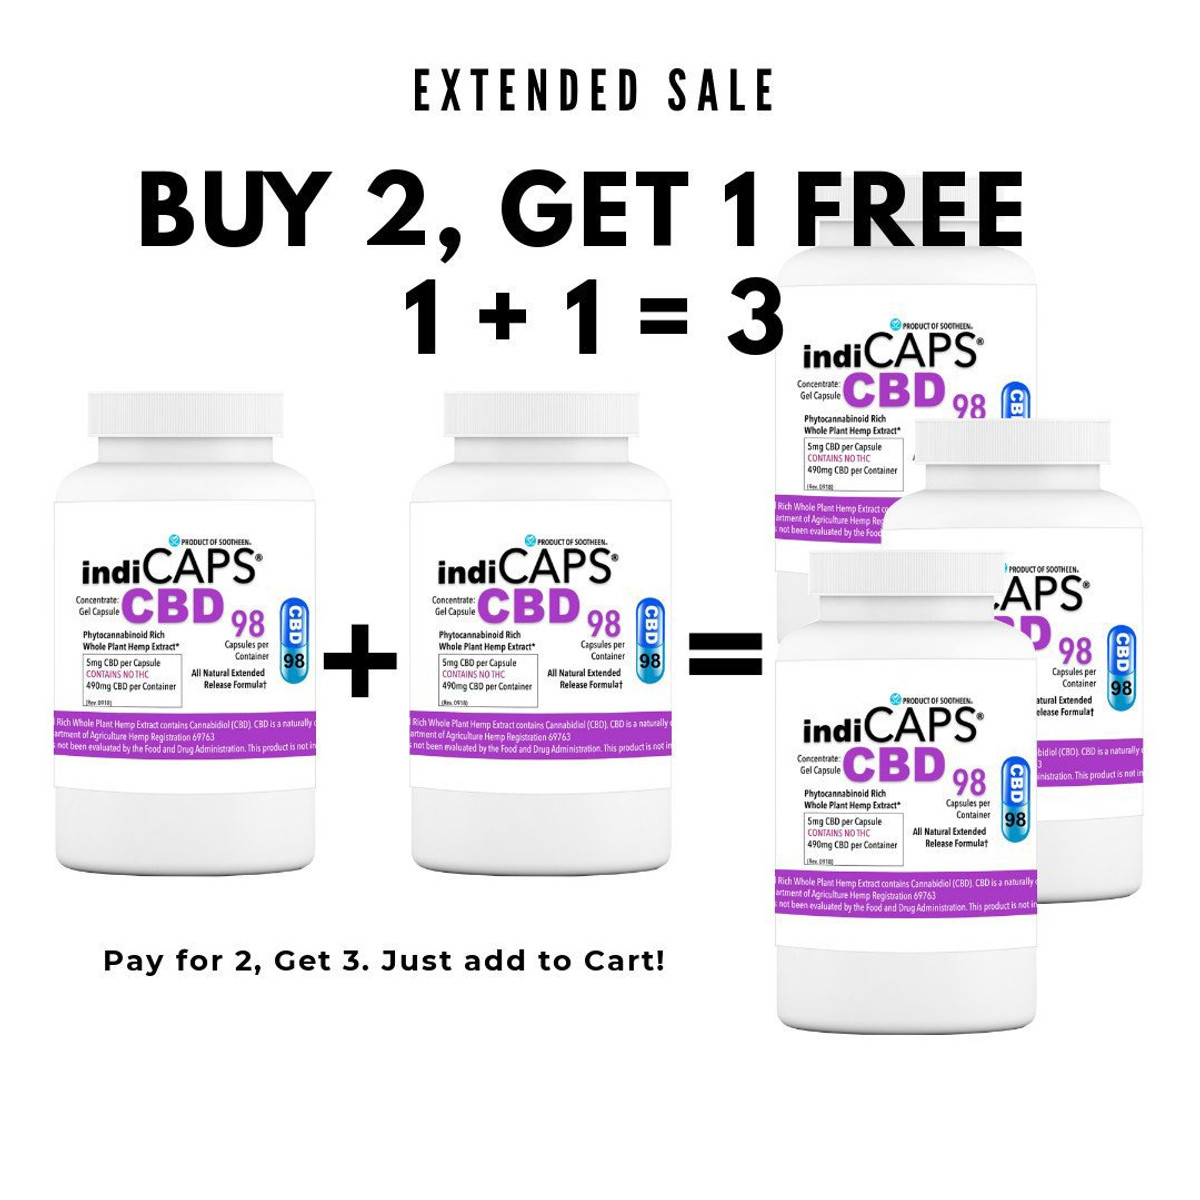 1 +1 = 3   indiCAPS® CBD Capsules - 5 mg / 98 capsules per bottle (490 mg per bottle)